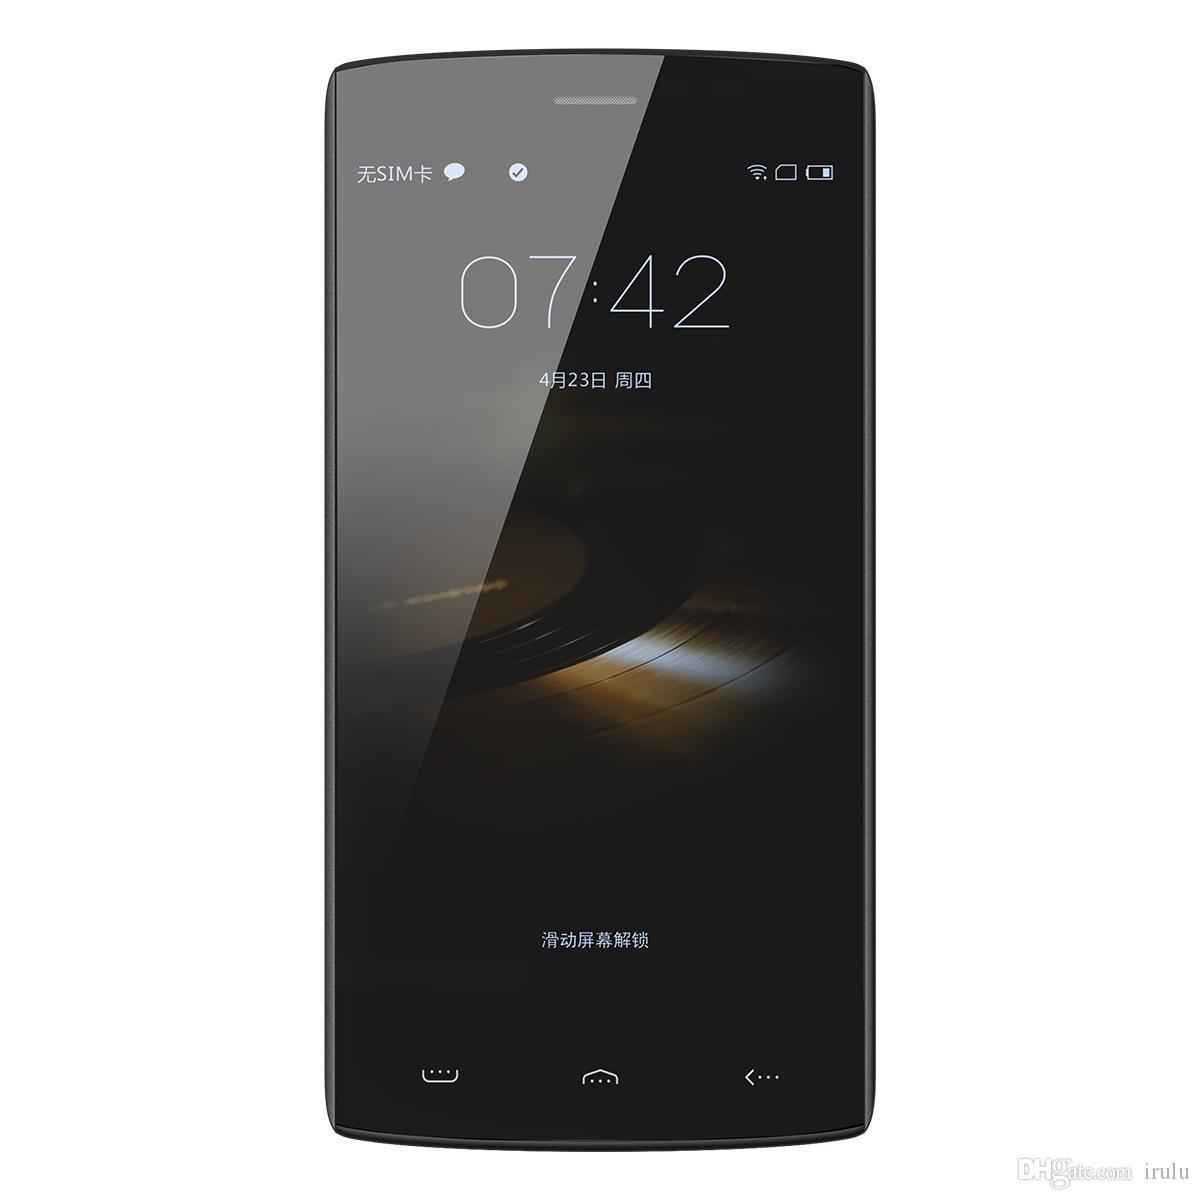 "Original HOMTOM 5.5"" HT7 MTK6580A 1.3GHz Quad Core1280x720 HD Screen Android 5.1 1G RAM 8G ROM 8.0MP 3G Smartphone"